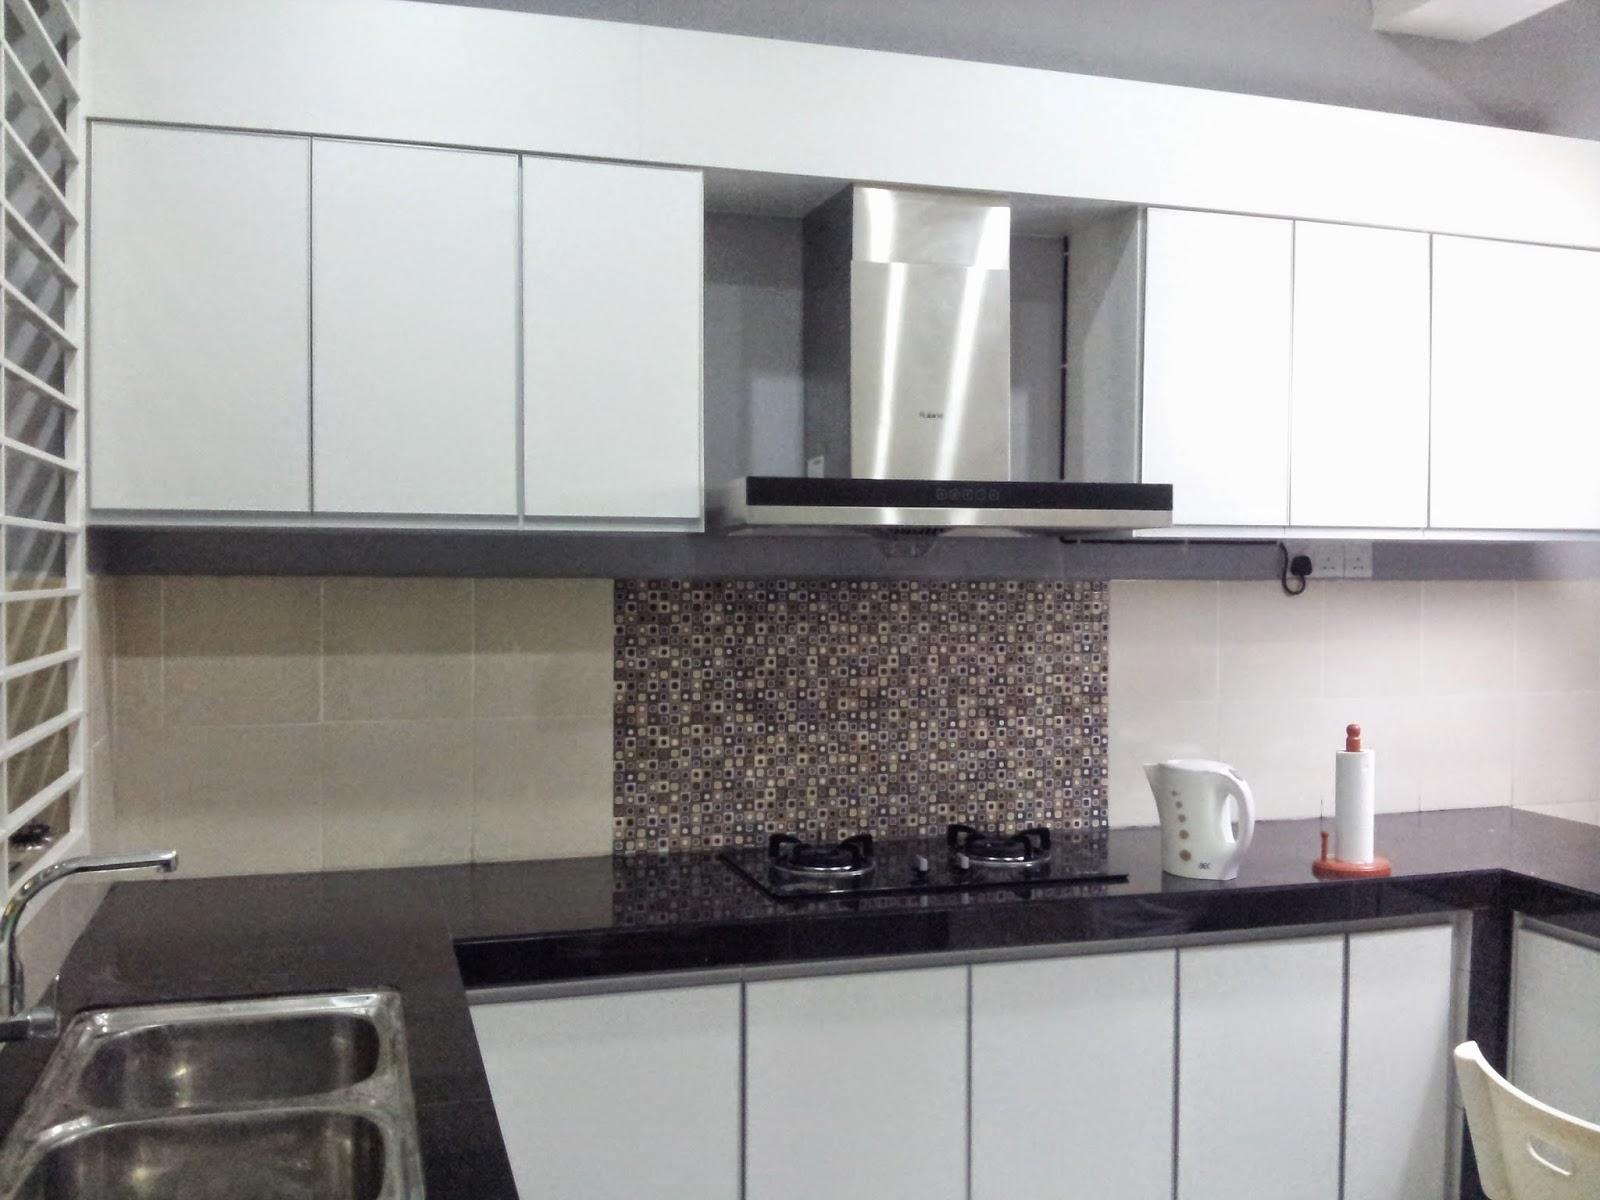 Pilihan Paling Murah Tapi Lebih Heavy Duty Dan Easy Maintenance Berbanding Granite Lain Untuk Surface Atas Just Gunakan Tiles Bersaiz